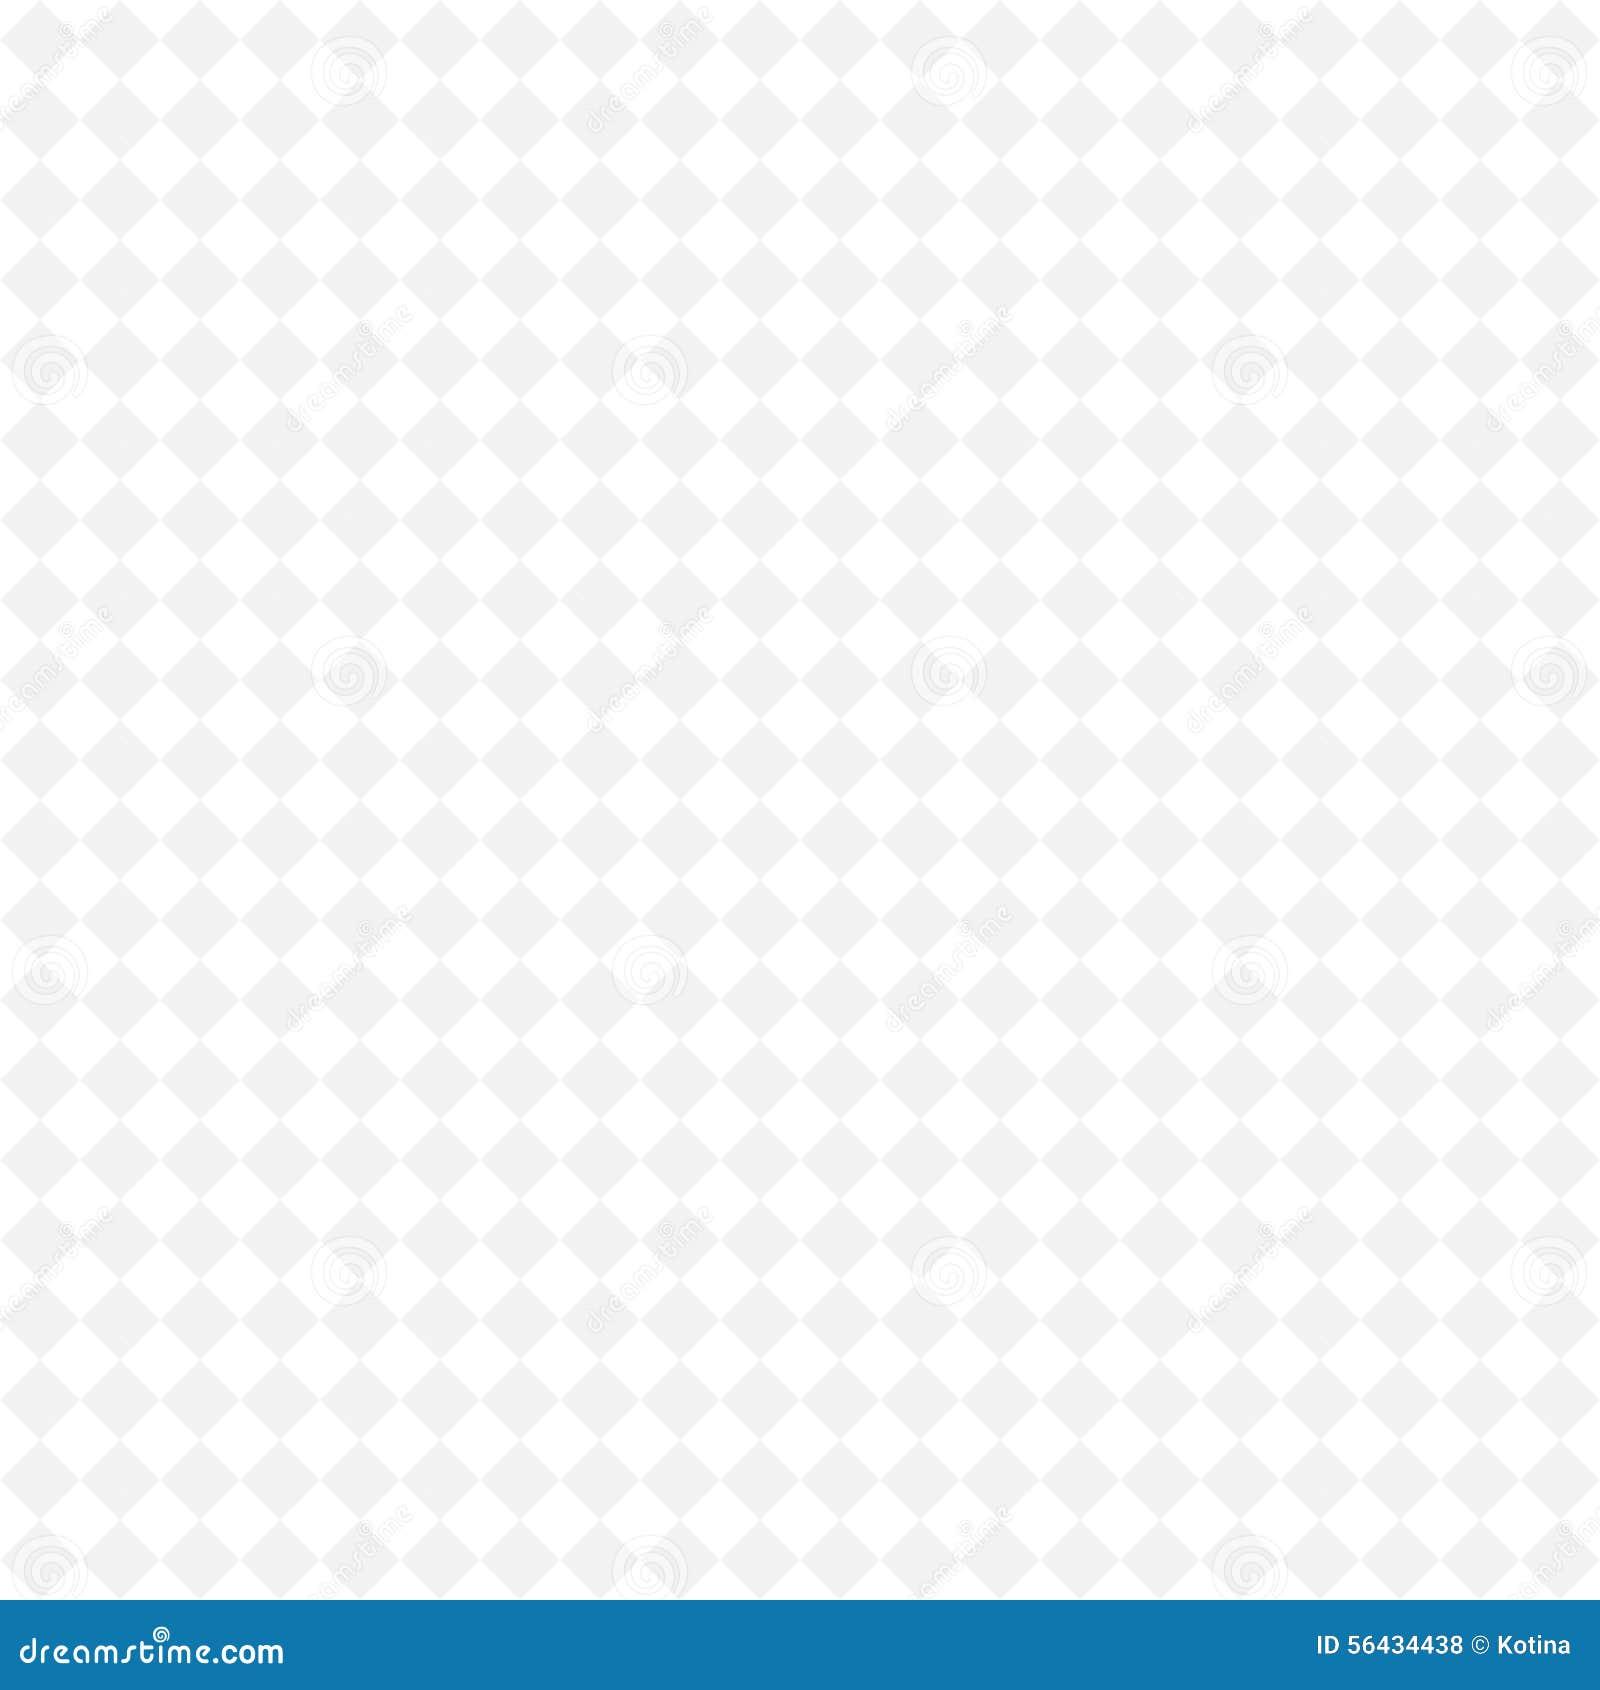 Simple Geometric Monochrome Pattern, Seamless Background